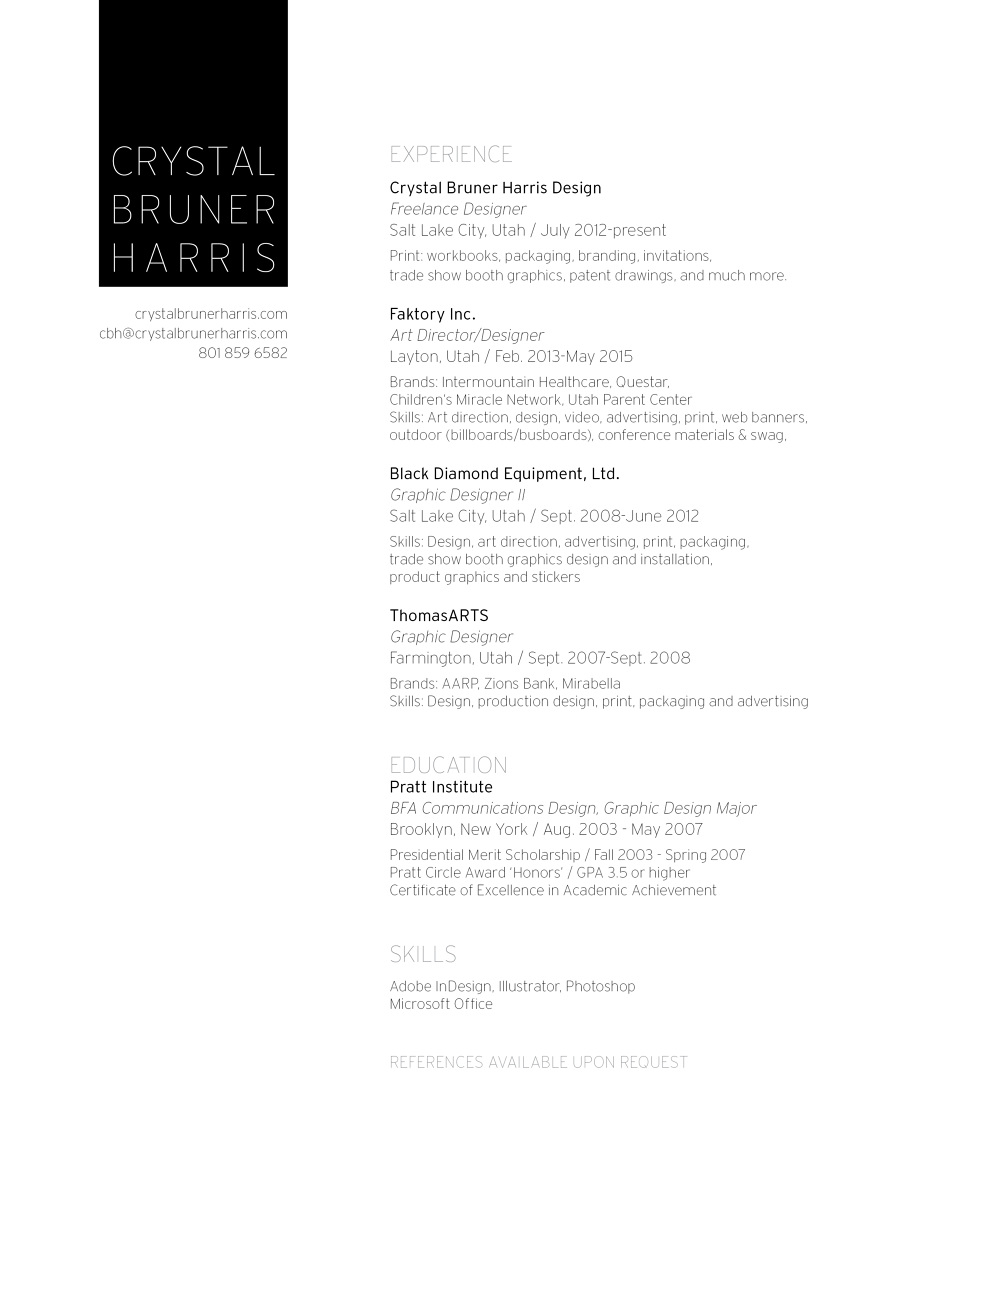 Download resume Resume Crystal Bruner Harris art